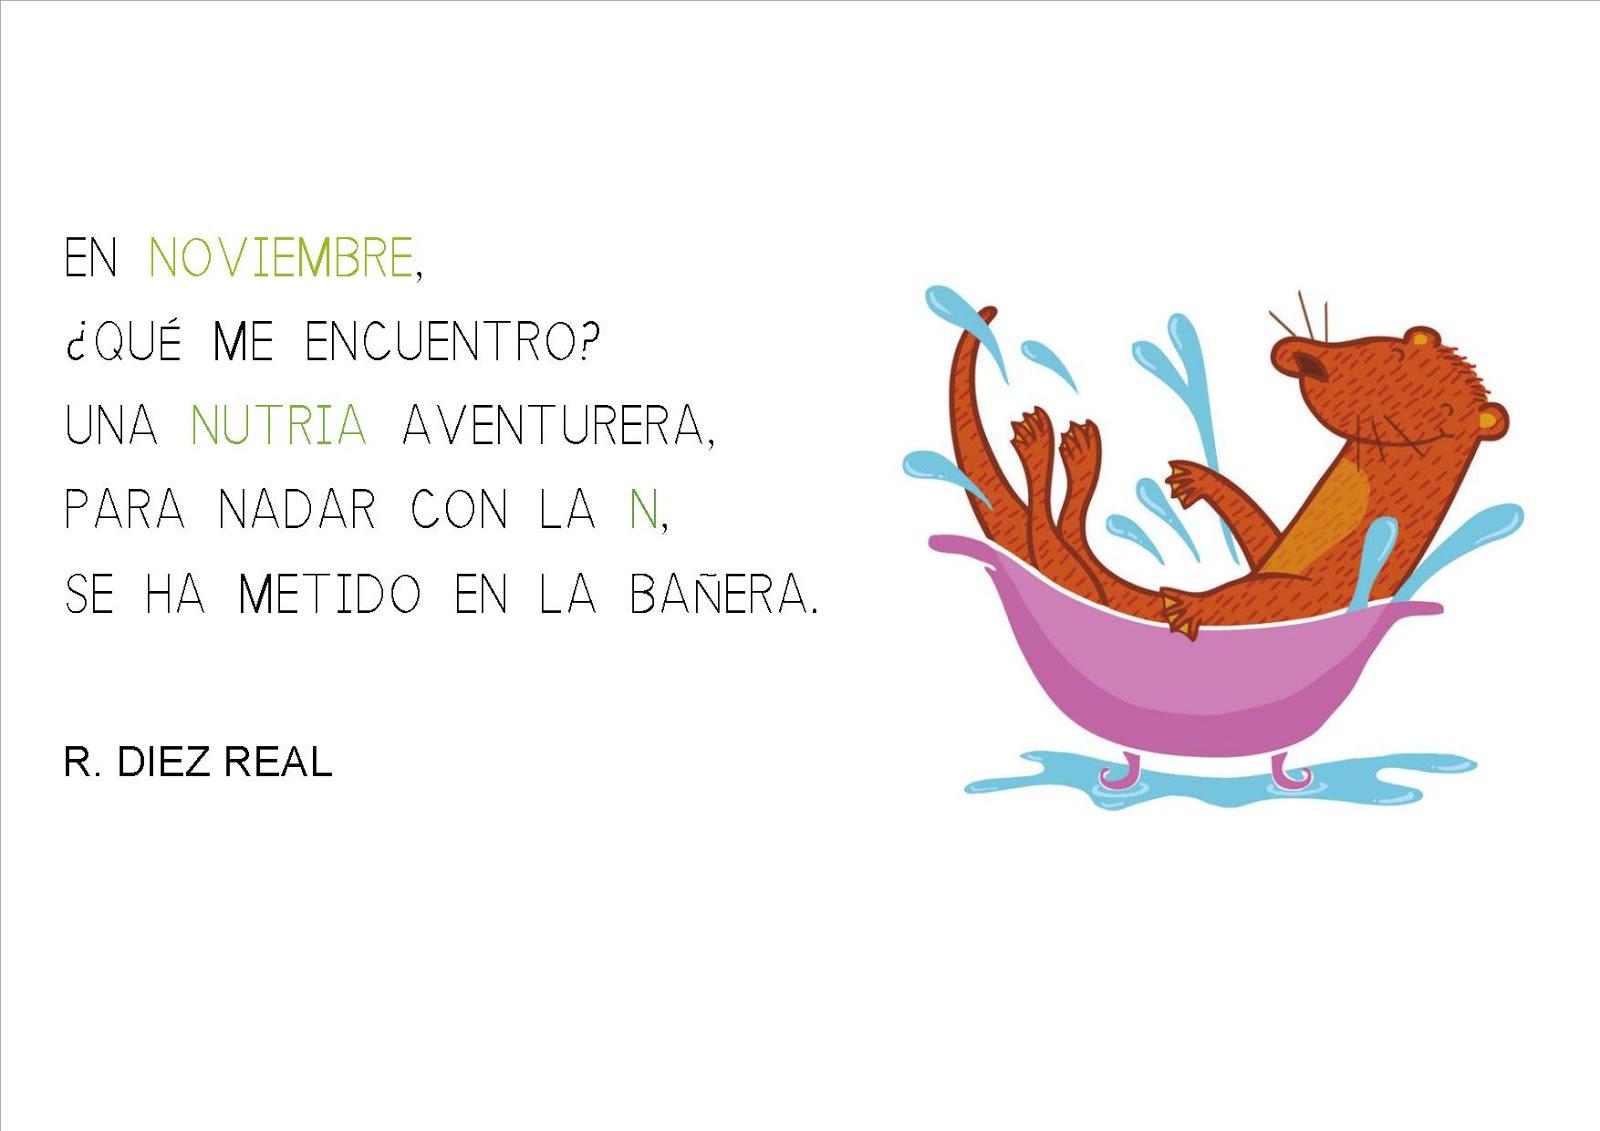 Aula de Infantil, 1º y 2º de Primaria de Viguera: RIMAS DE NOVIEMBRE